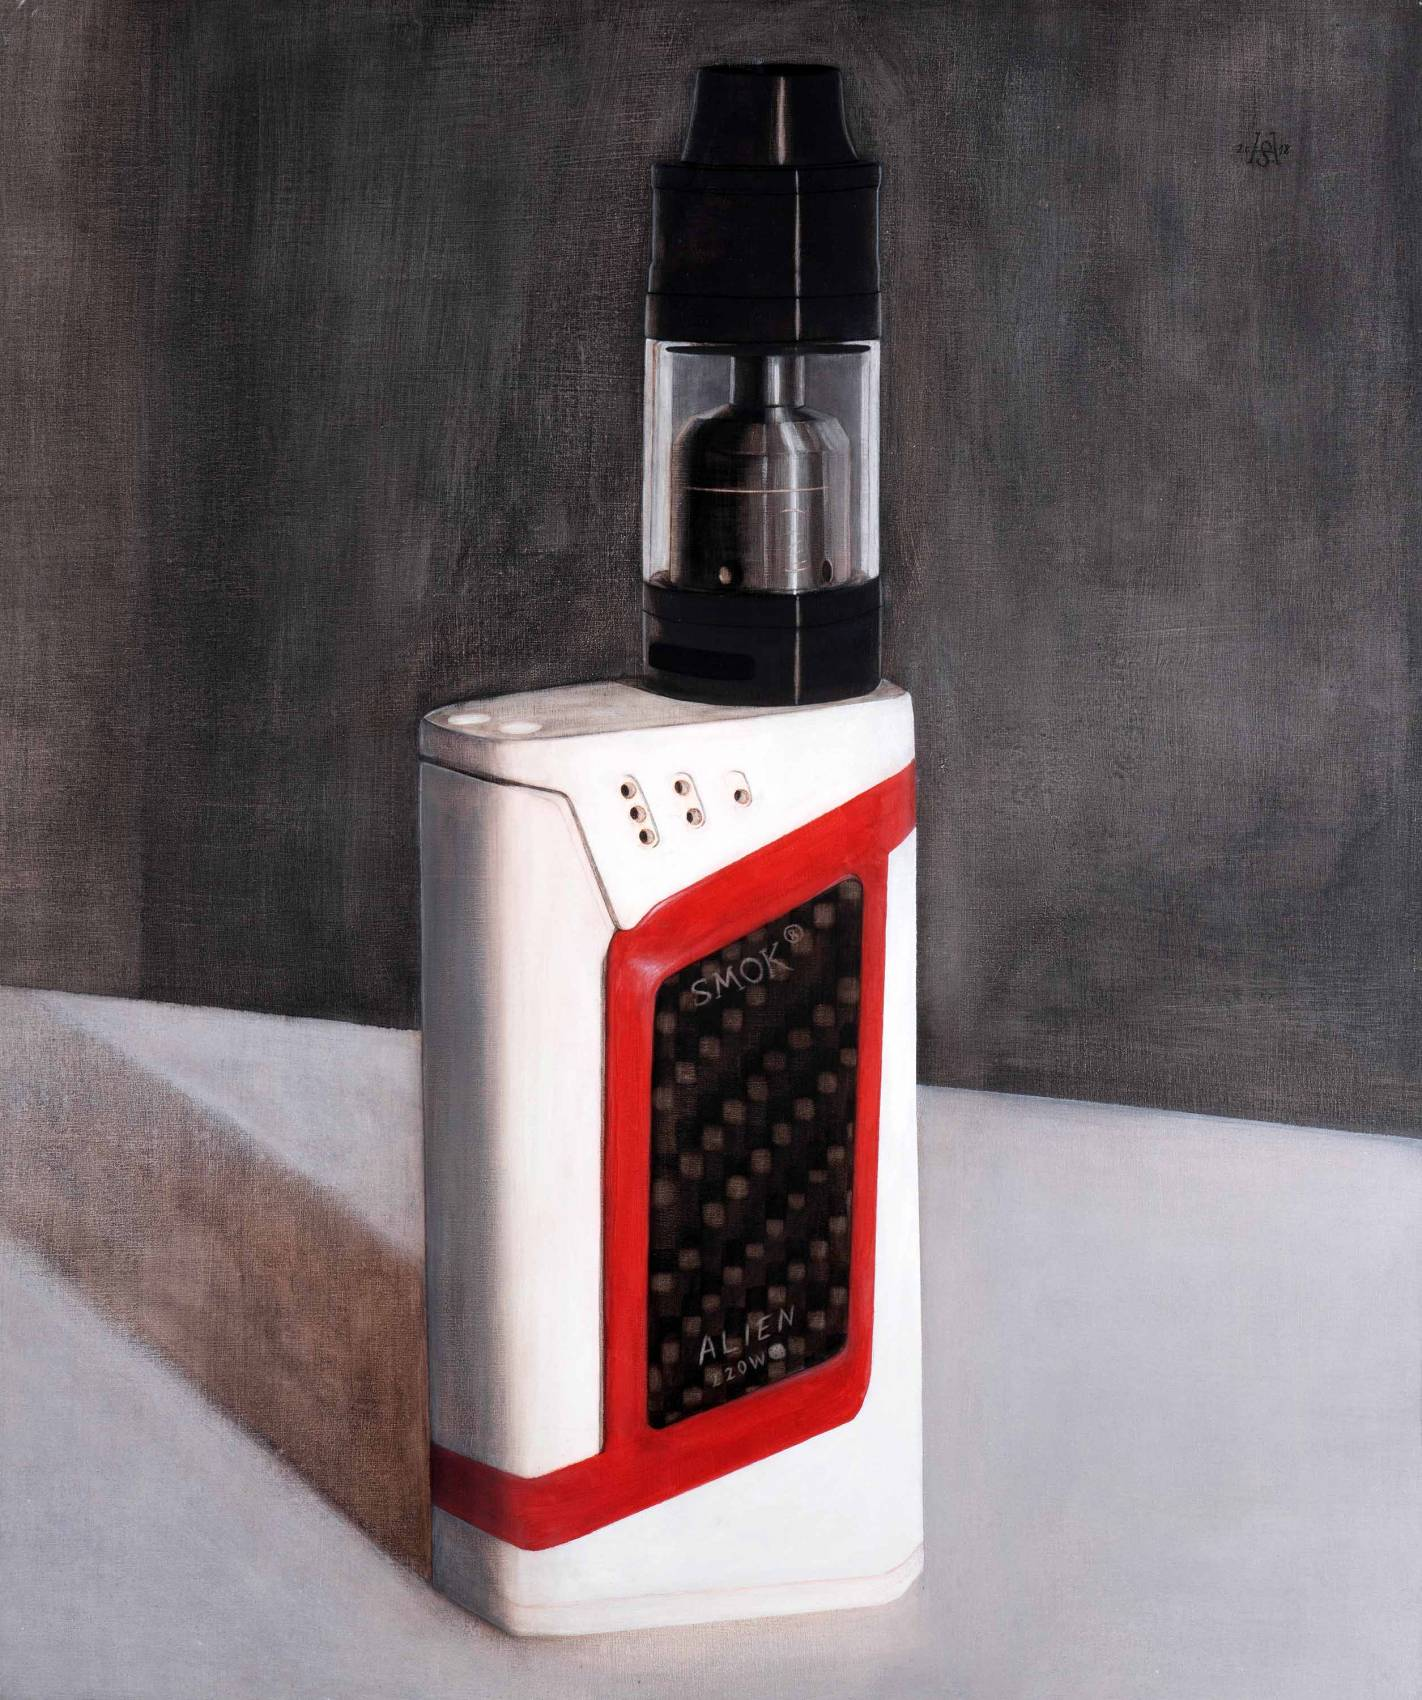 SMOK ALIEN 220 W TC, 2018. Acryl auf Leinwand. 110 x 92 cm. Foto: Phillip Hiersemann